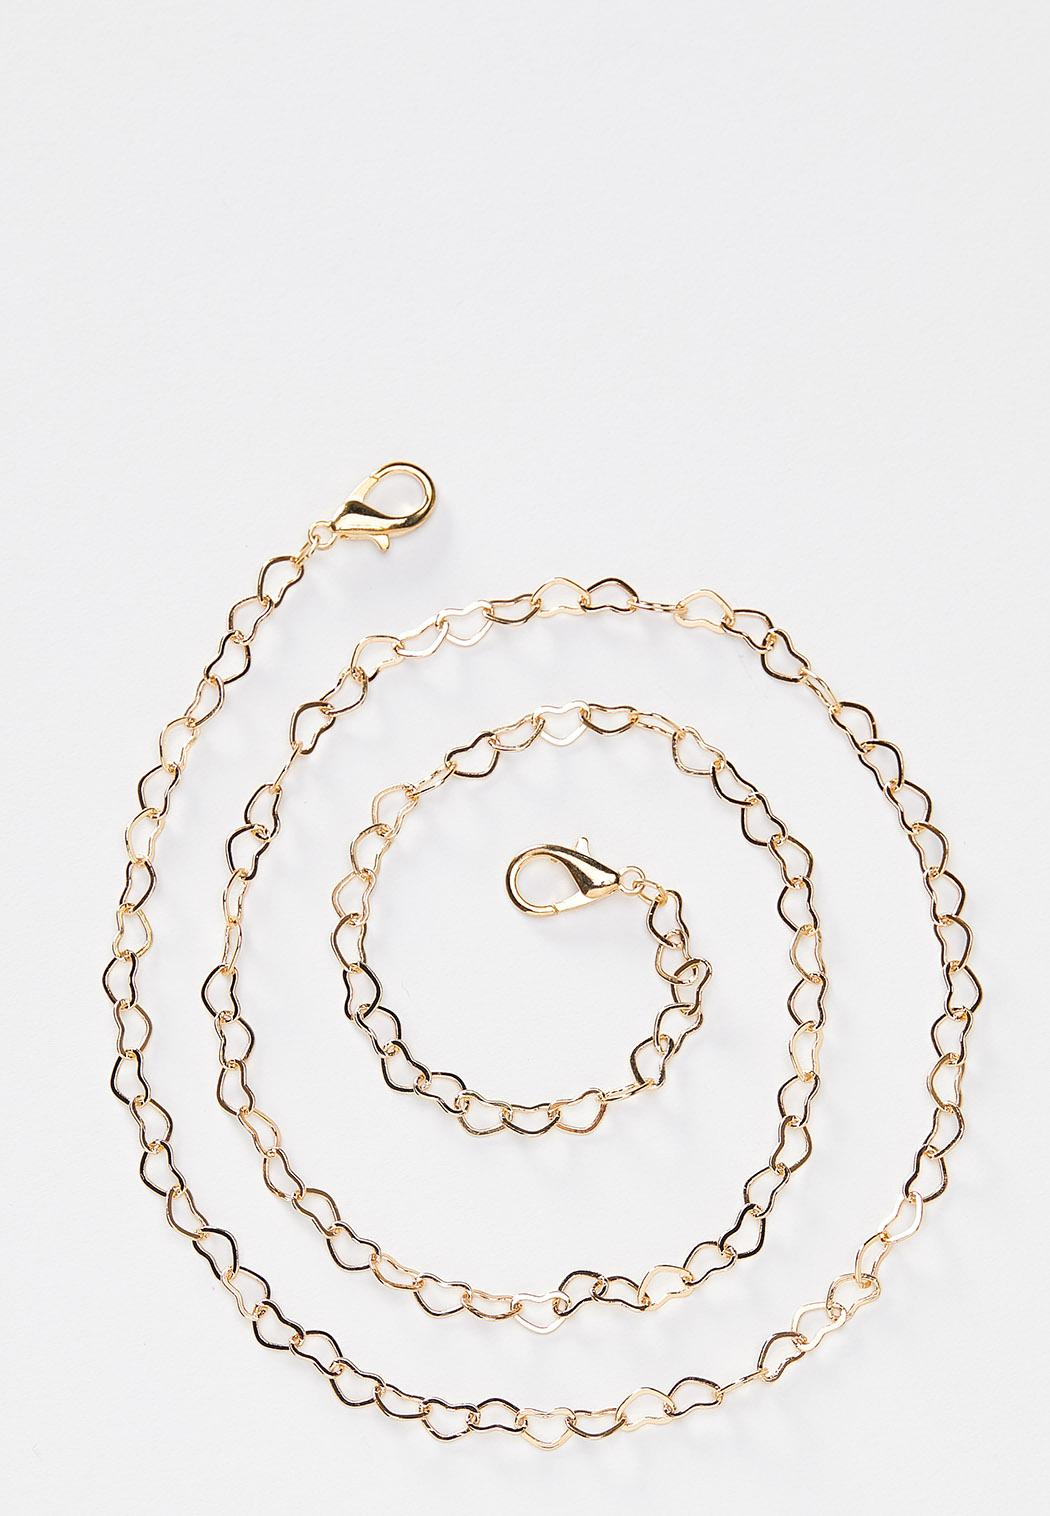 Gold Heart Face Mask Chain